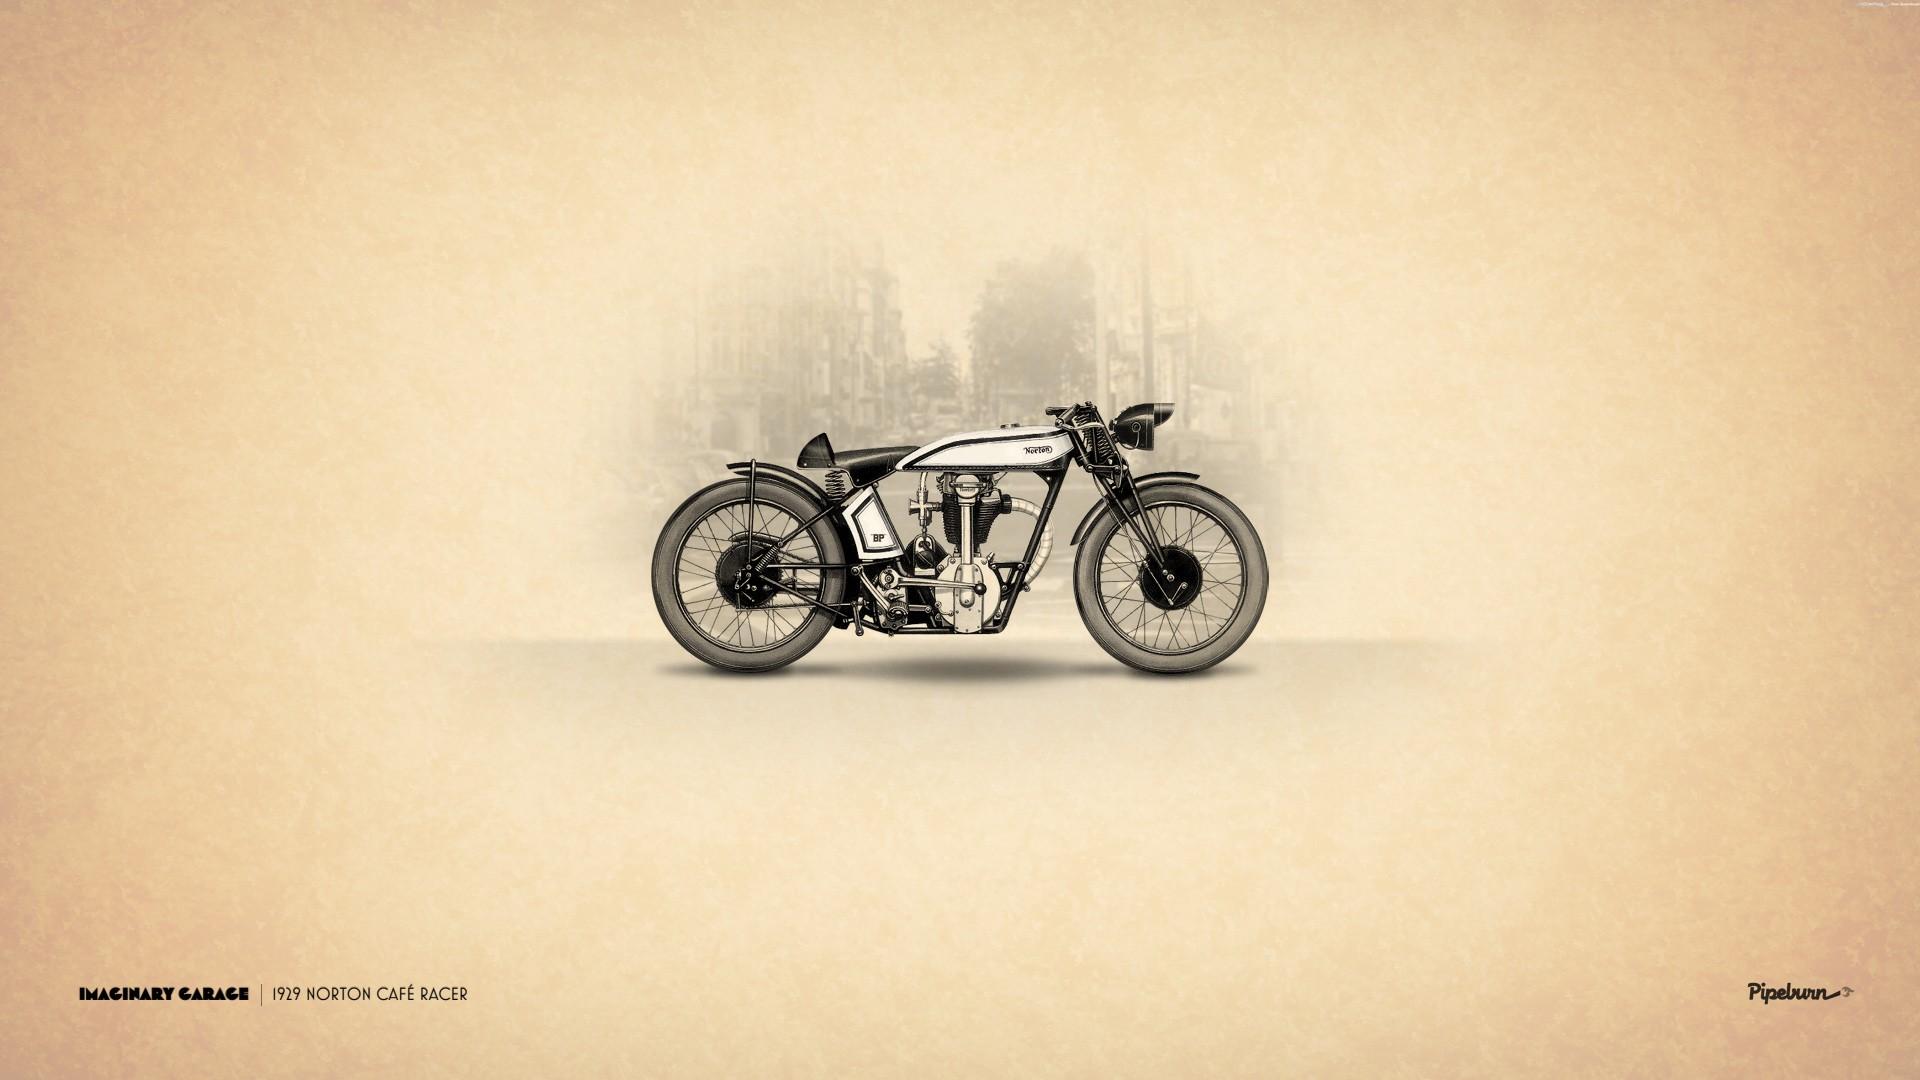 1929 norton cafe racer motorcycle wallpaper 1920x1080